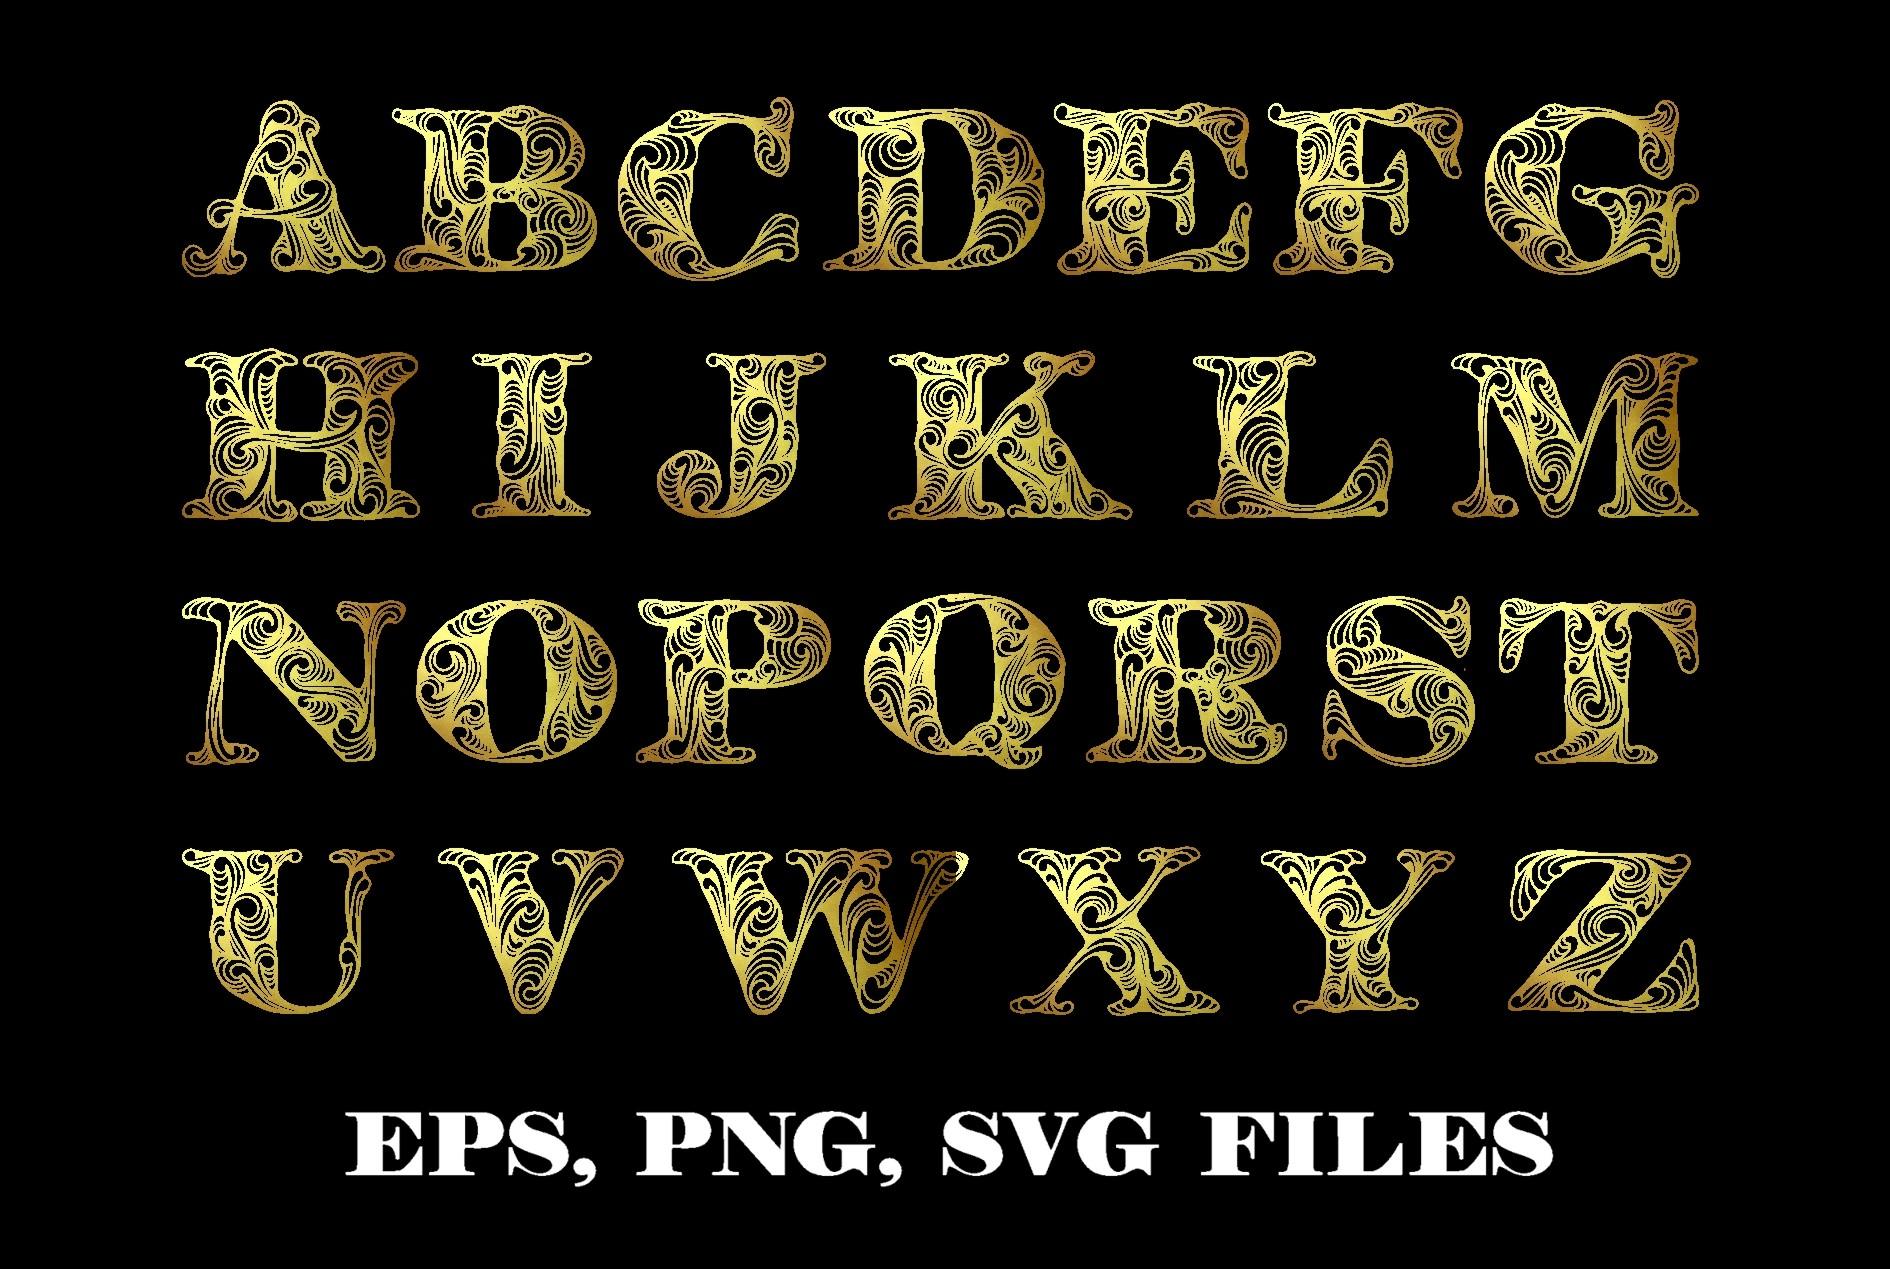 Alphabet clipart & vector example image 2